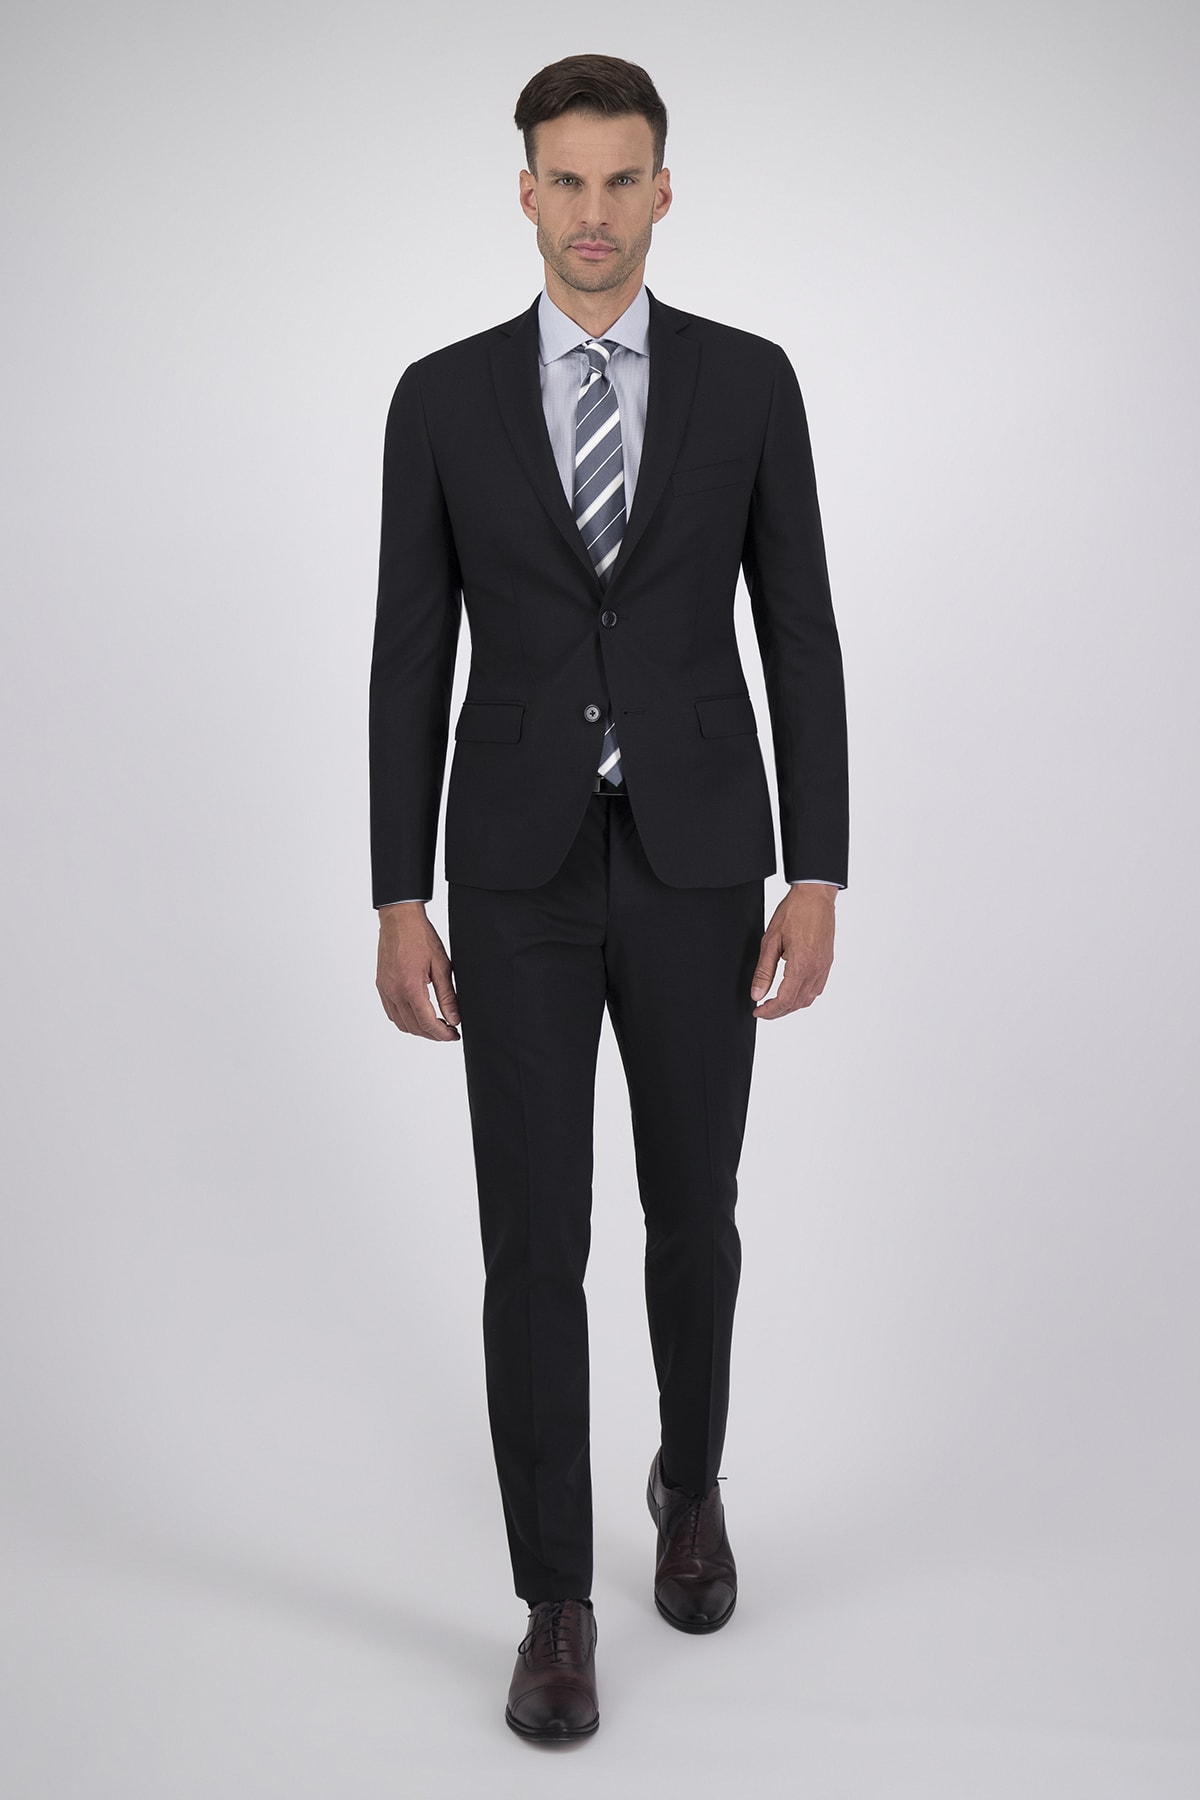 Traje High Life corte Extra Slim con tejido 100% lana negro